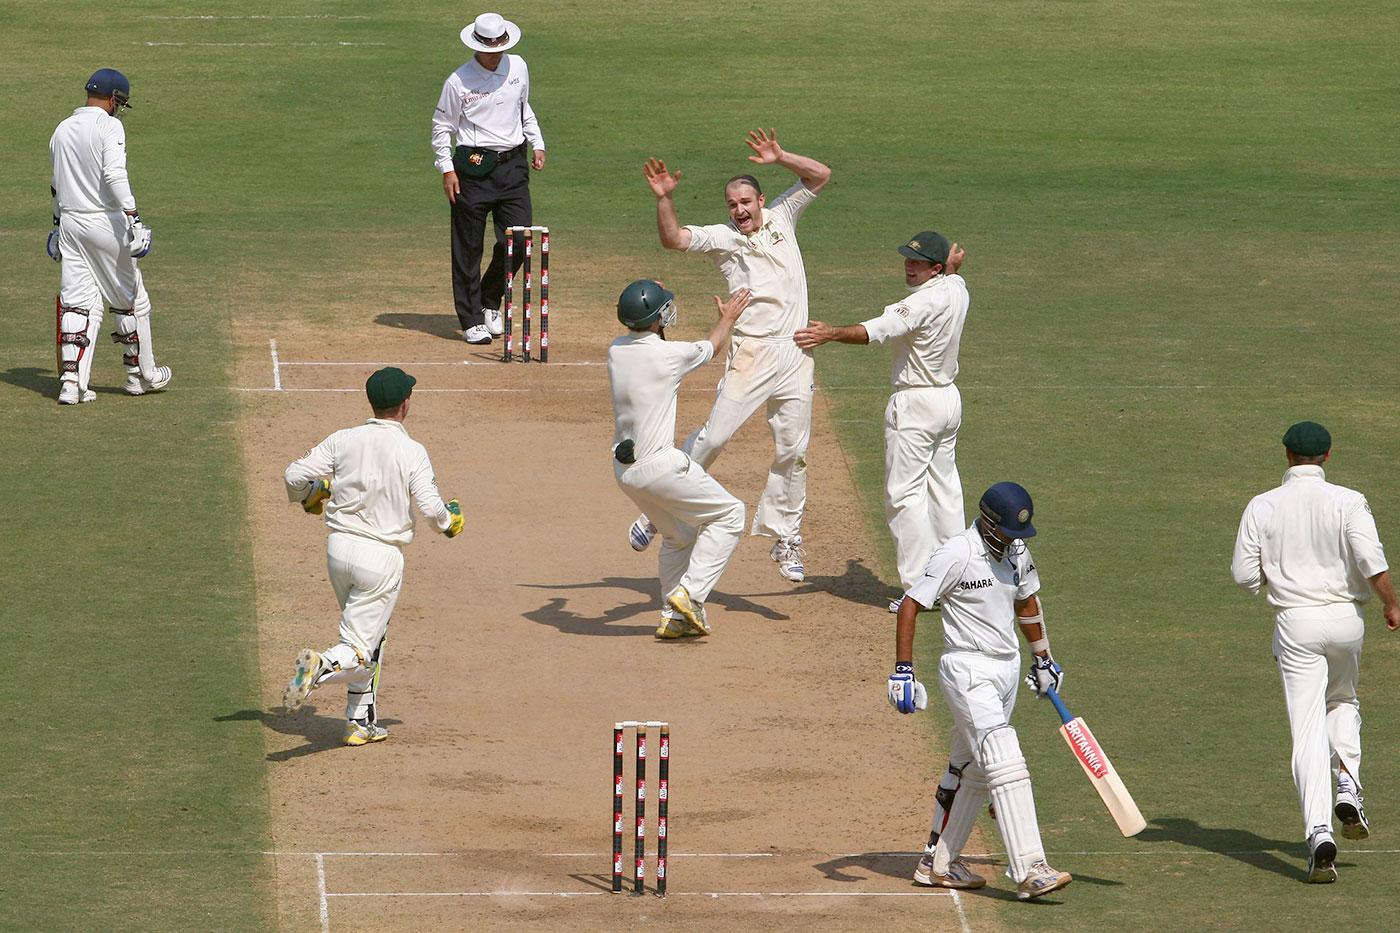 He'll always have Nagpur: Krejza celebrates his first Test wicket, Rahul Dravid